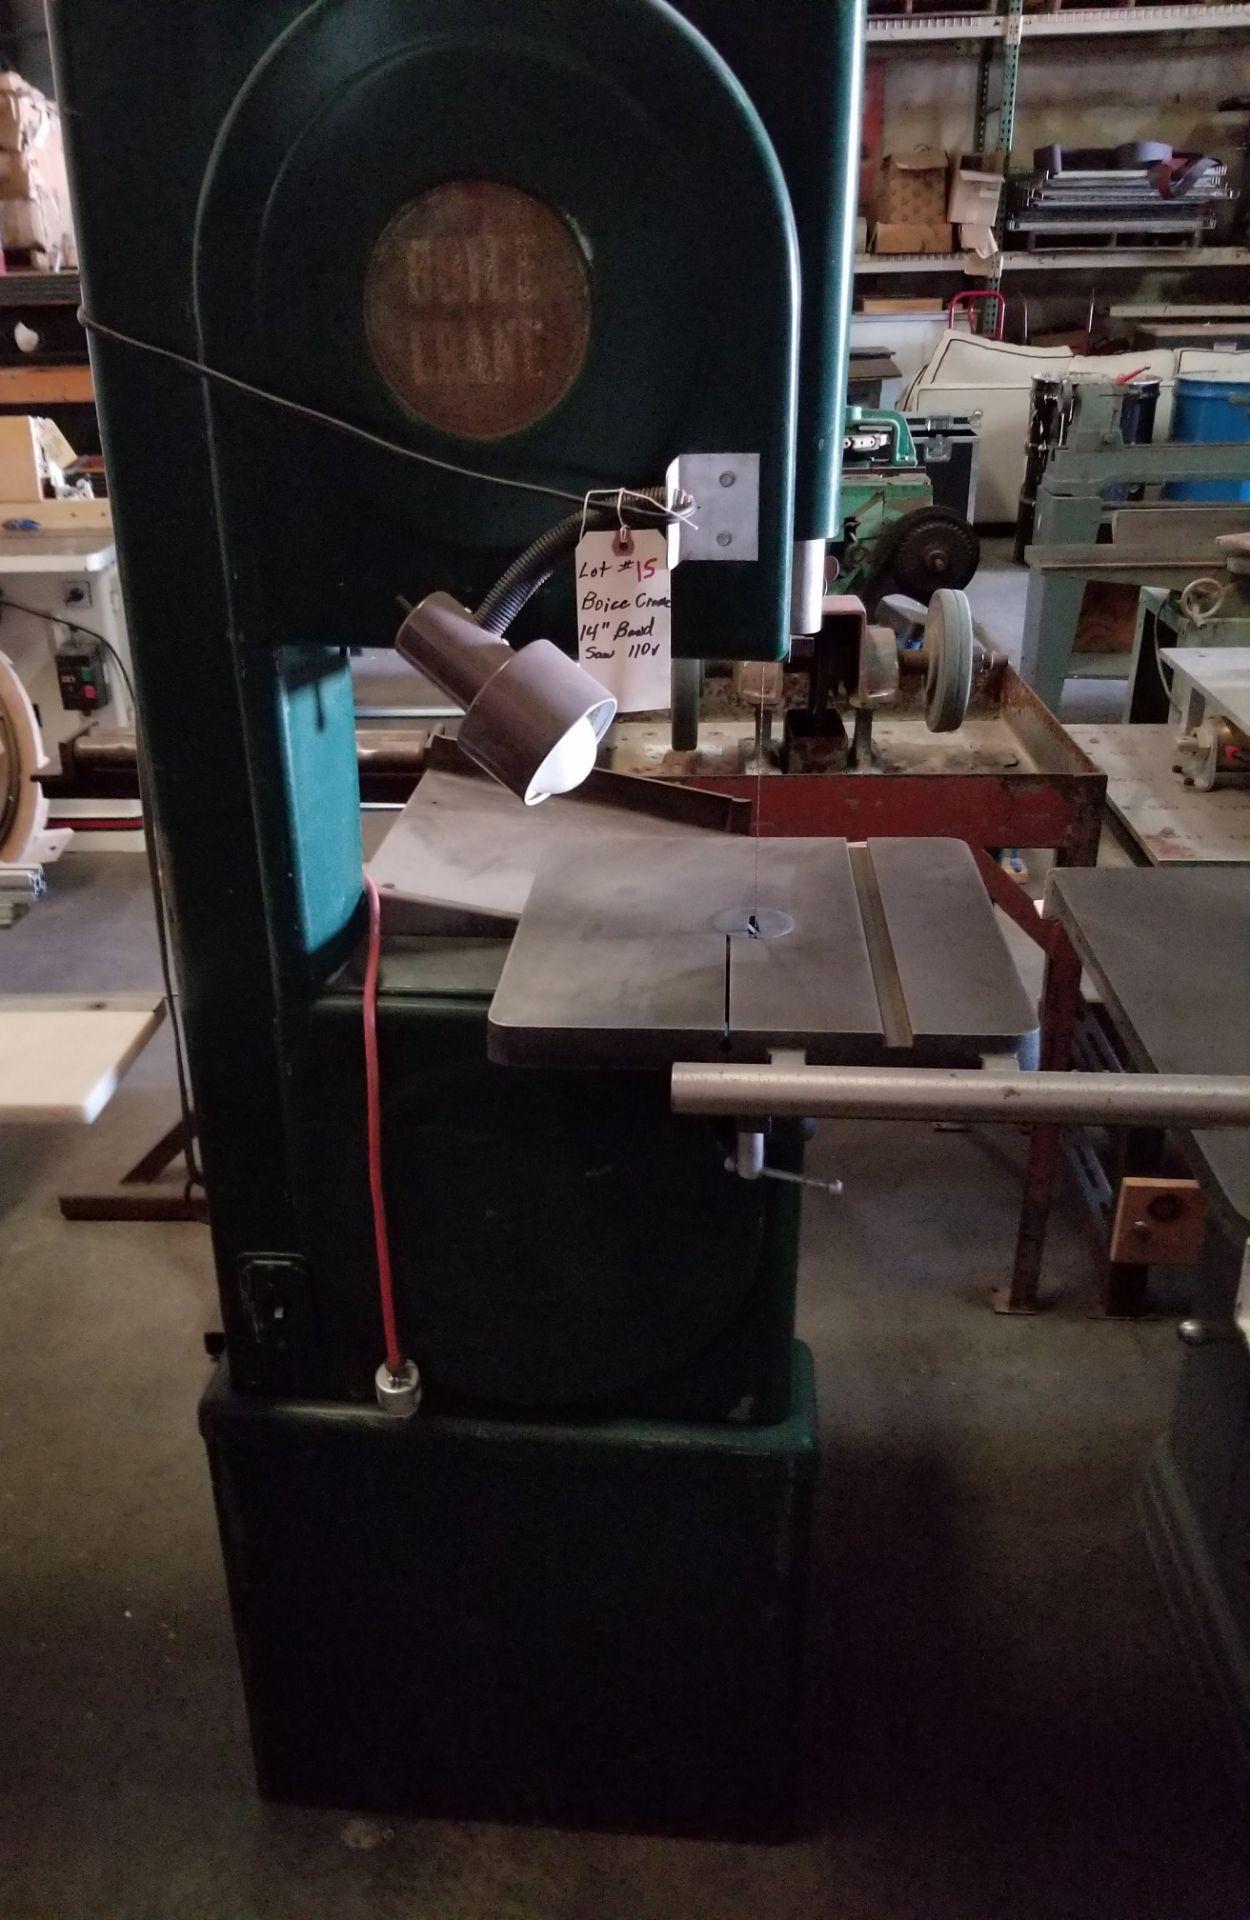 "Lot 15 - Boice Crane Vertical Band Saw #4709 Made in USA, 110V, 98"" saw blade"